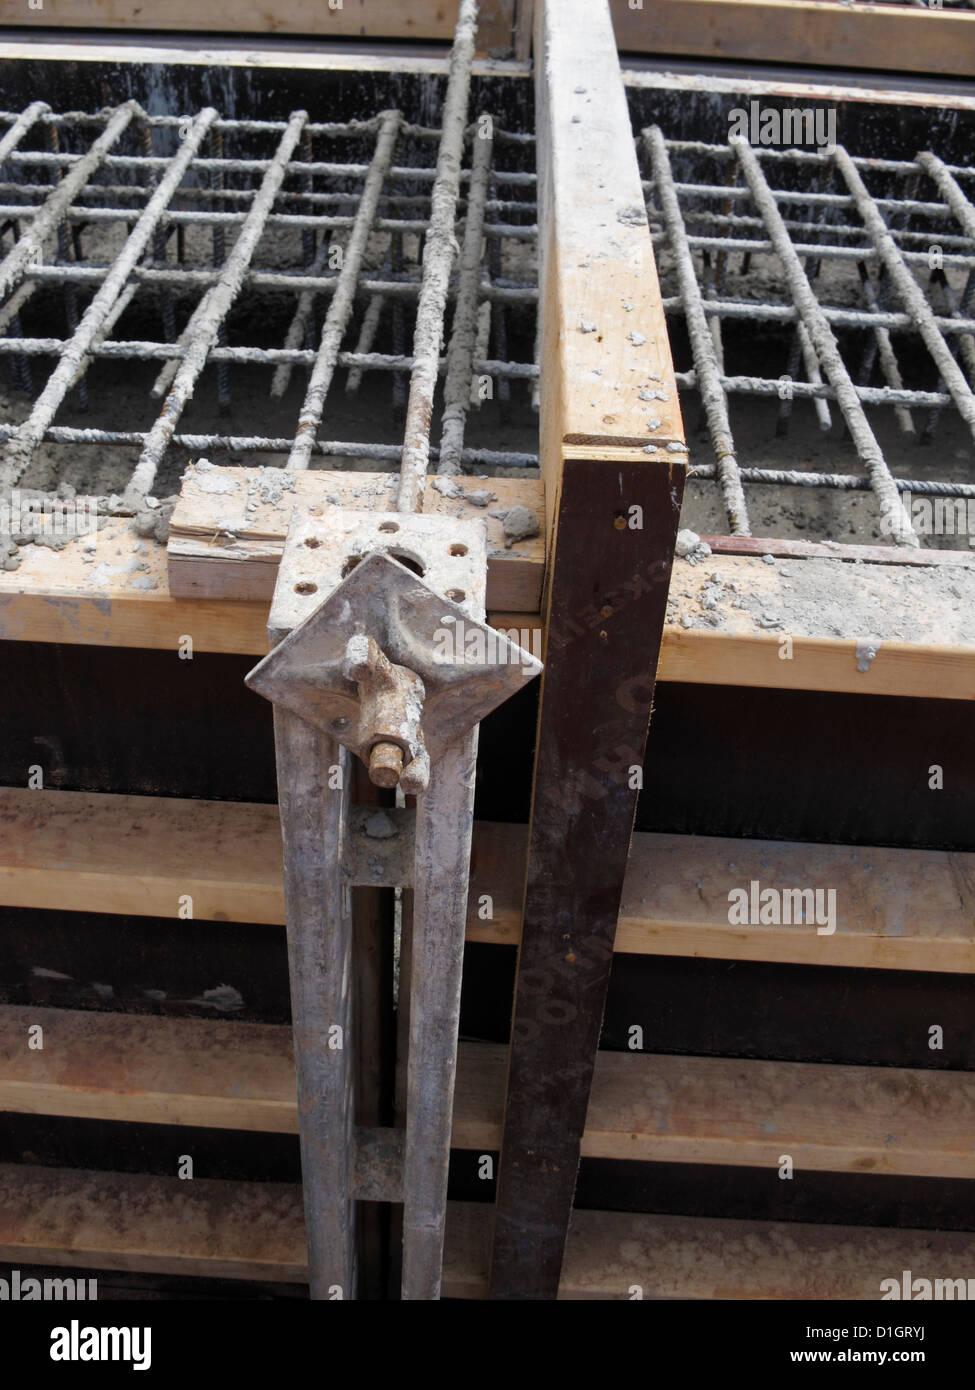 Shuttering For Bridges : Shuttering concrete pour rebar timber formwork of strip